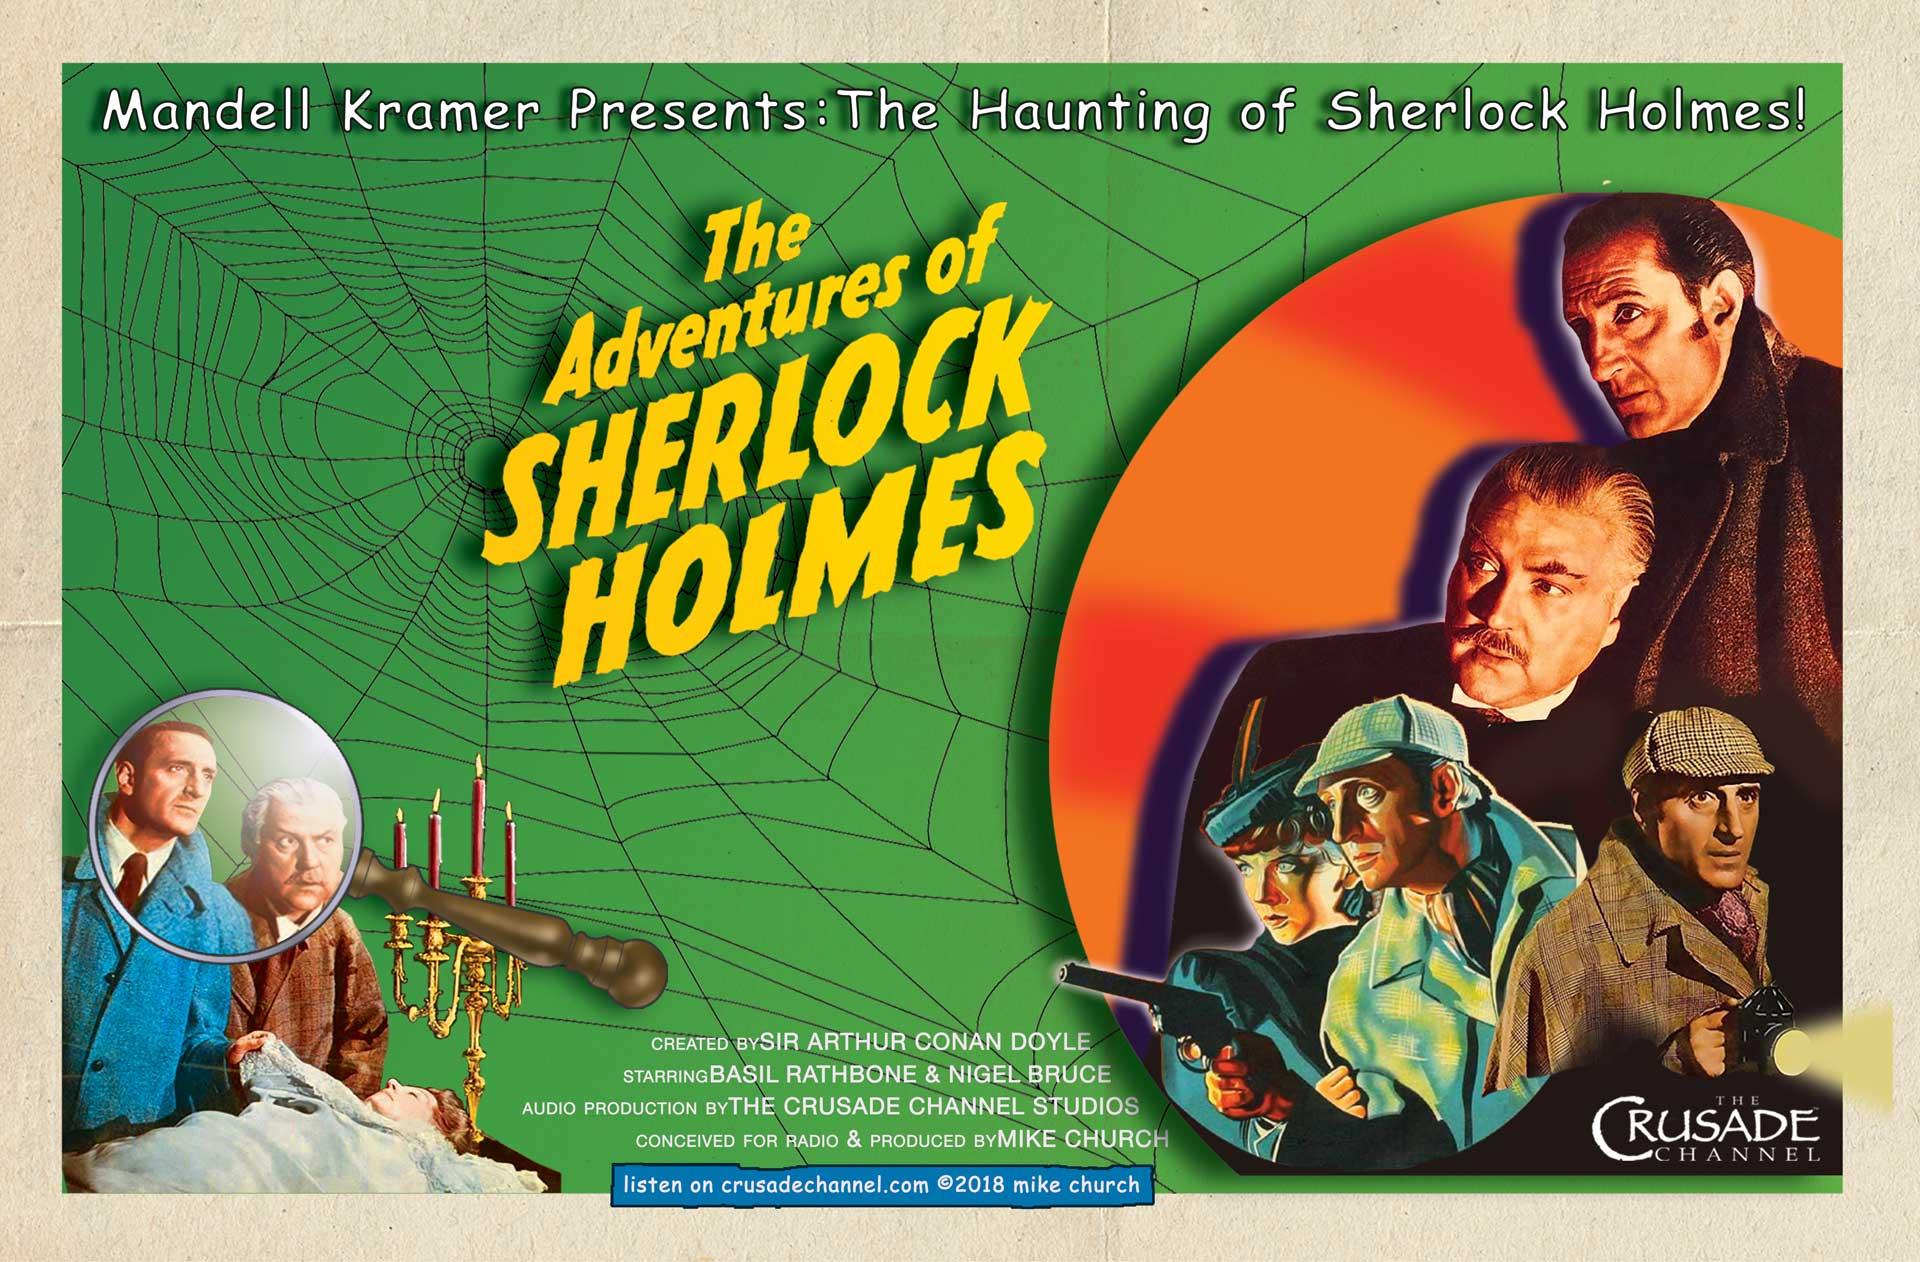 Mandell Kramer Presents, Sherlock Holmes In: The Haunting of Sherlock Holmes